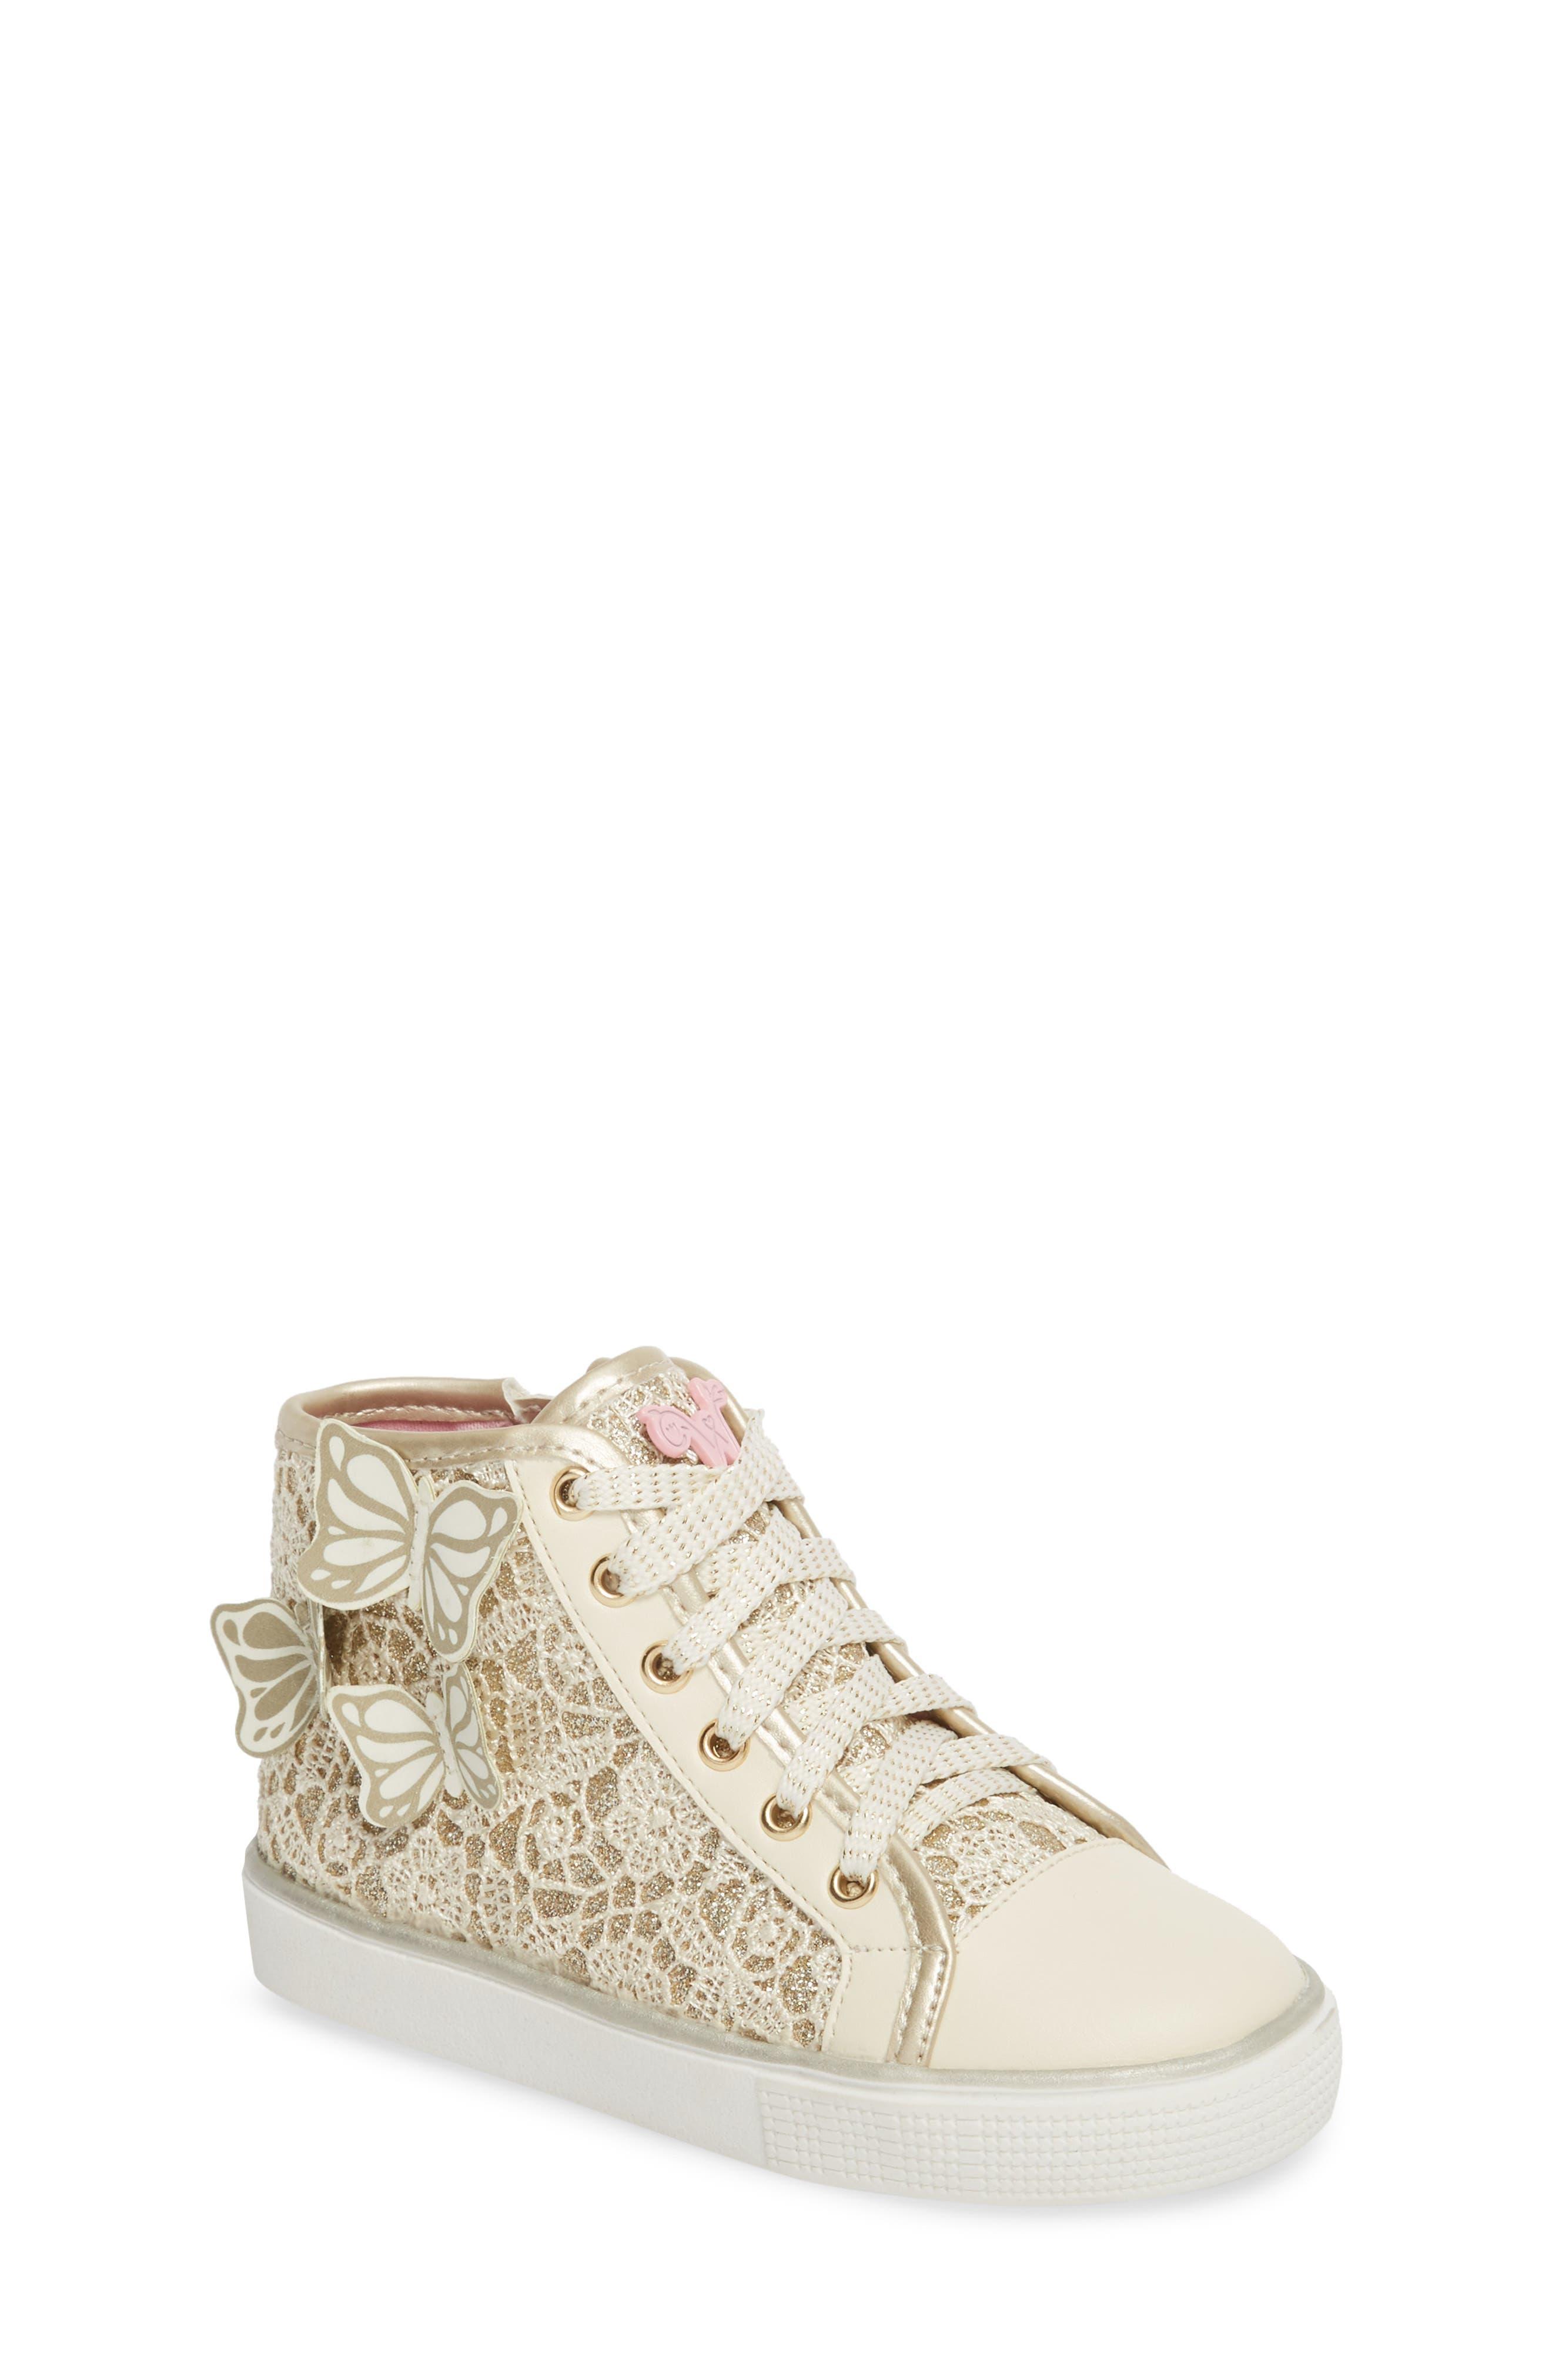 Ashlyn Glitter High Top Sneaker,                             Main thumbnail 1, color,                             710